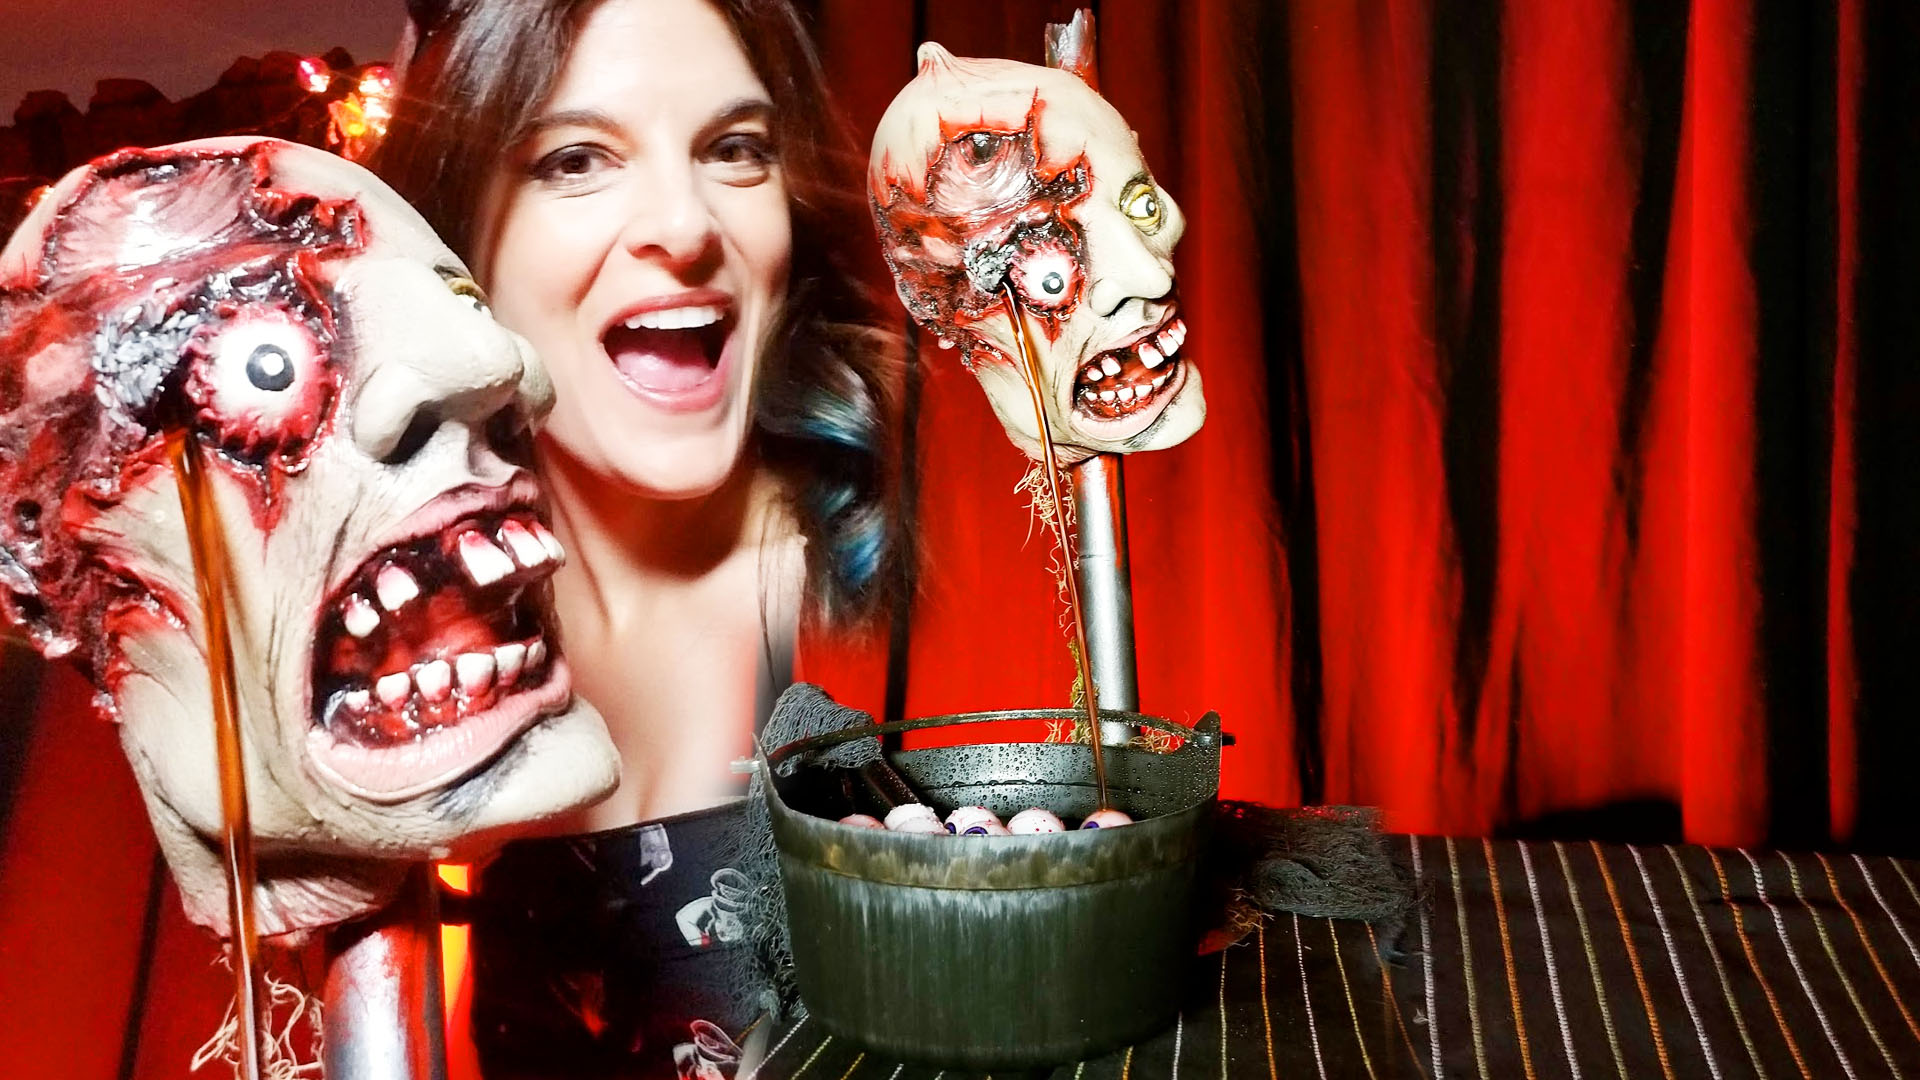 Zombie Head Drink Fountain | 360 Video | Live Stream